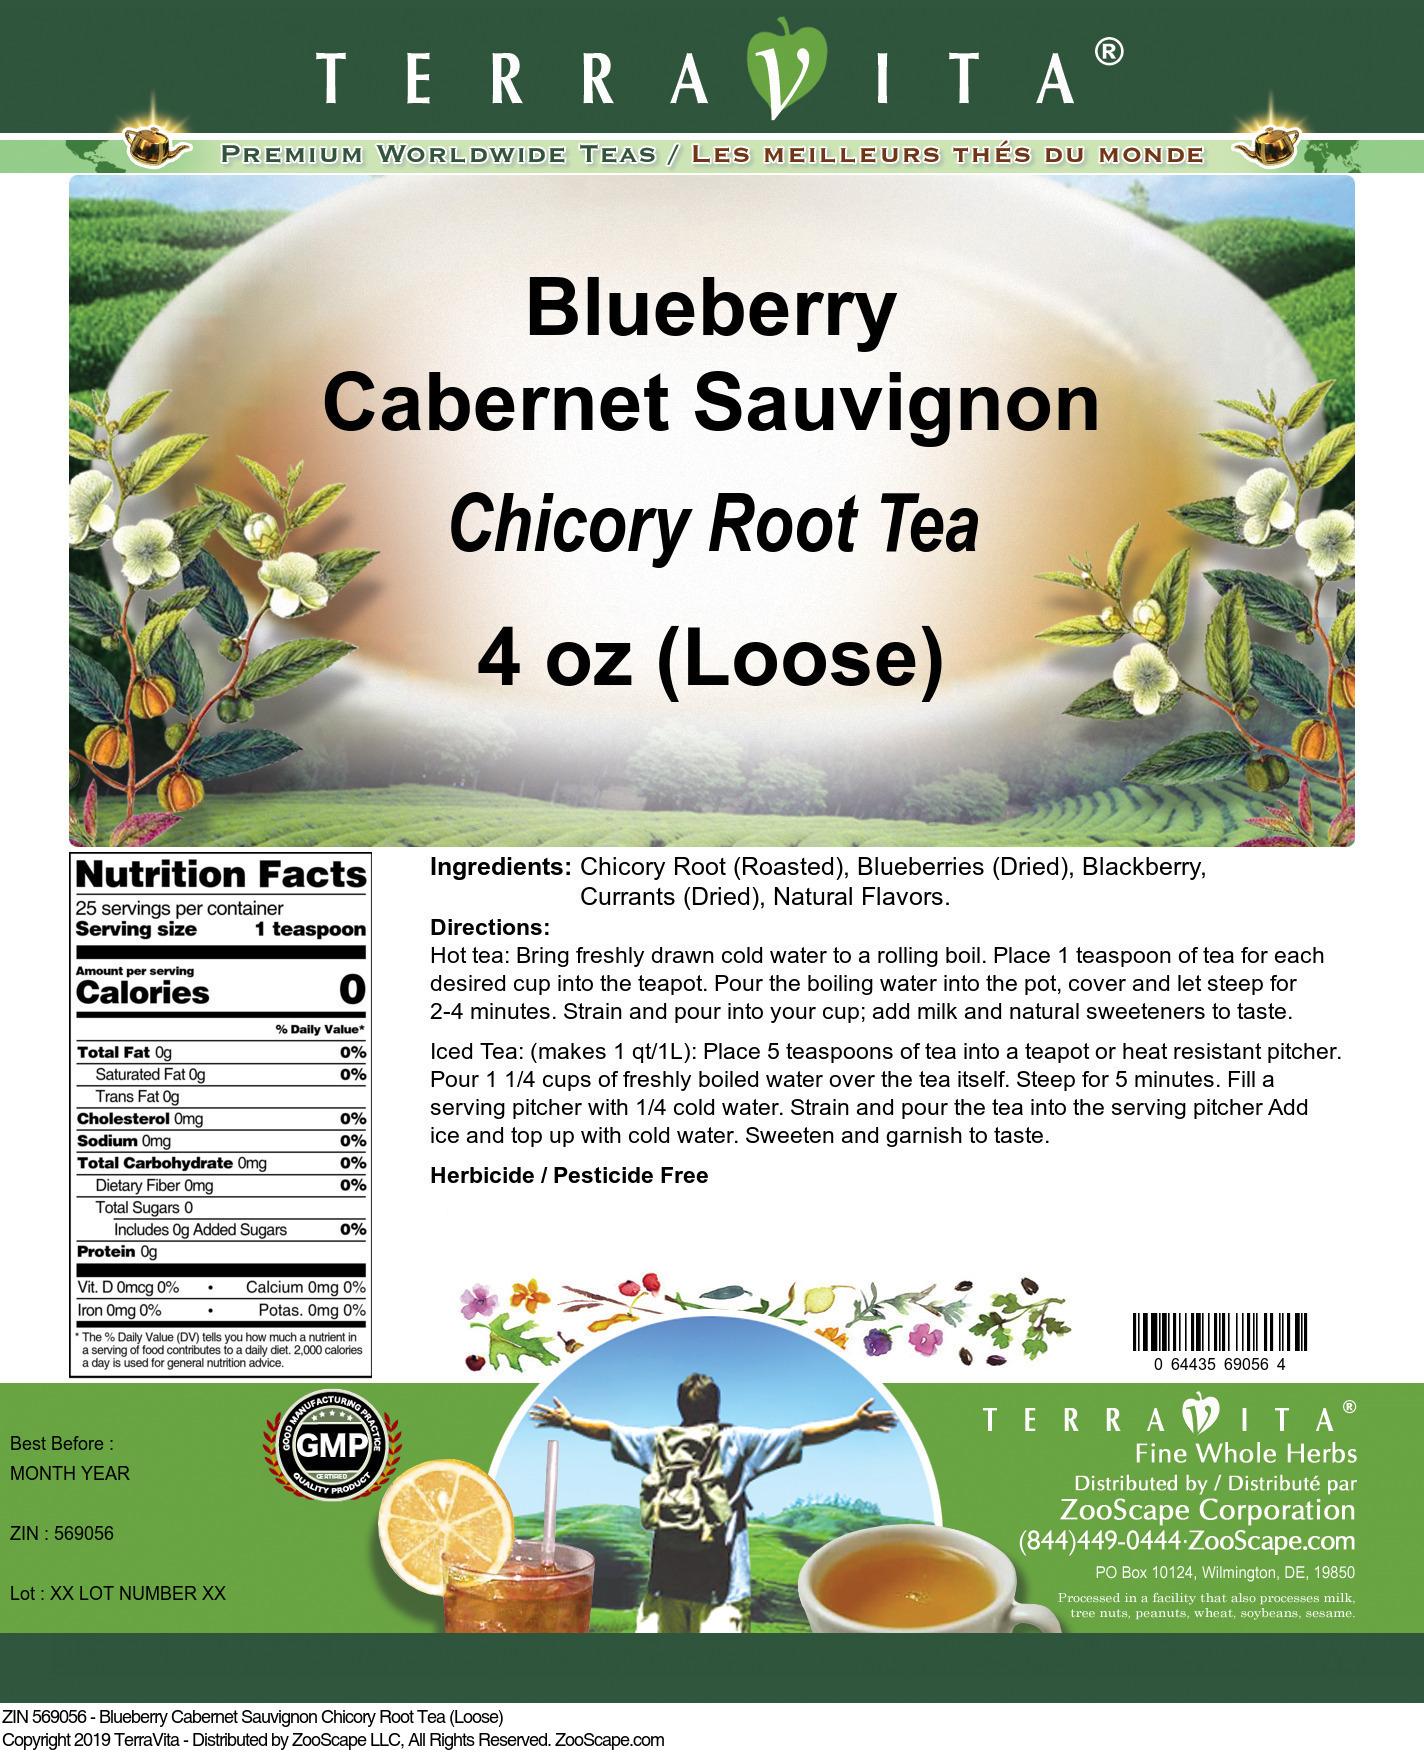 Blueberry Cabernet Sauvignon Chicory Root